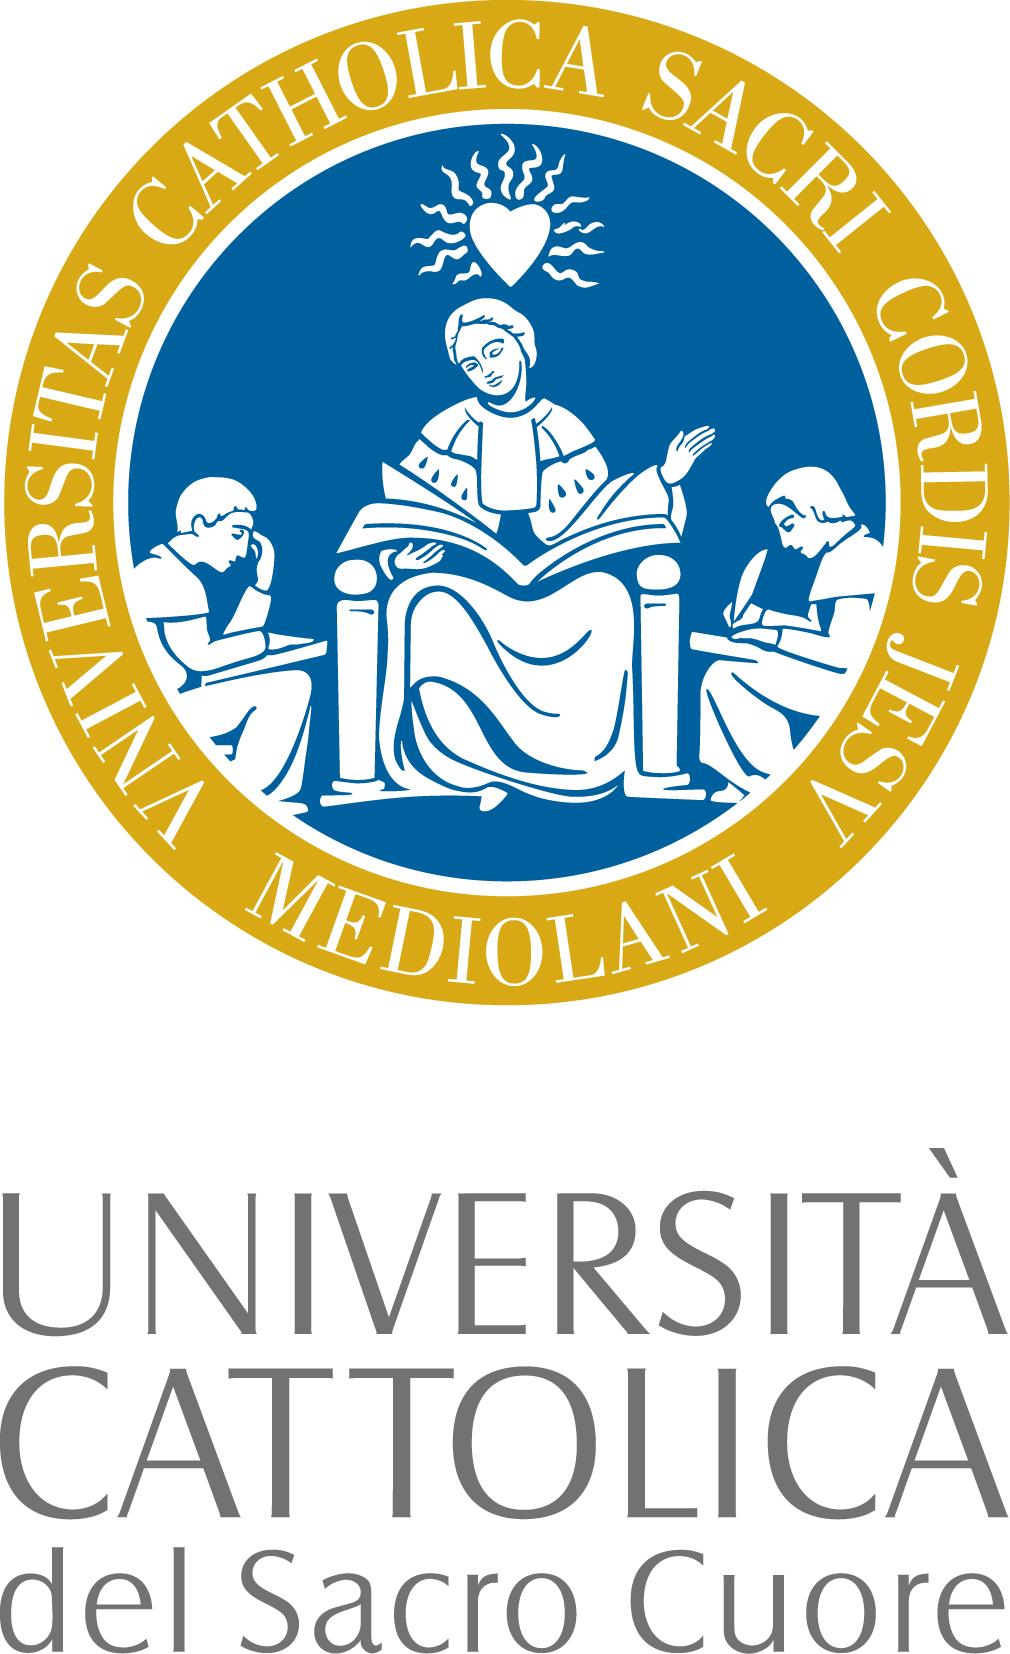 Milan unicatt_logo_verticale1.jpg